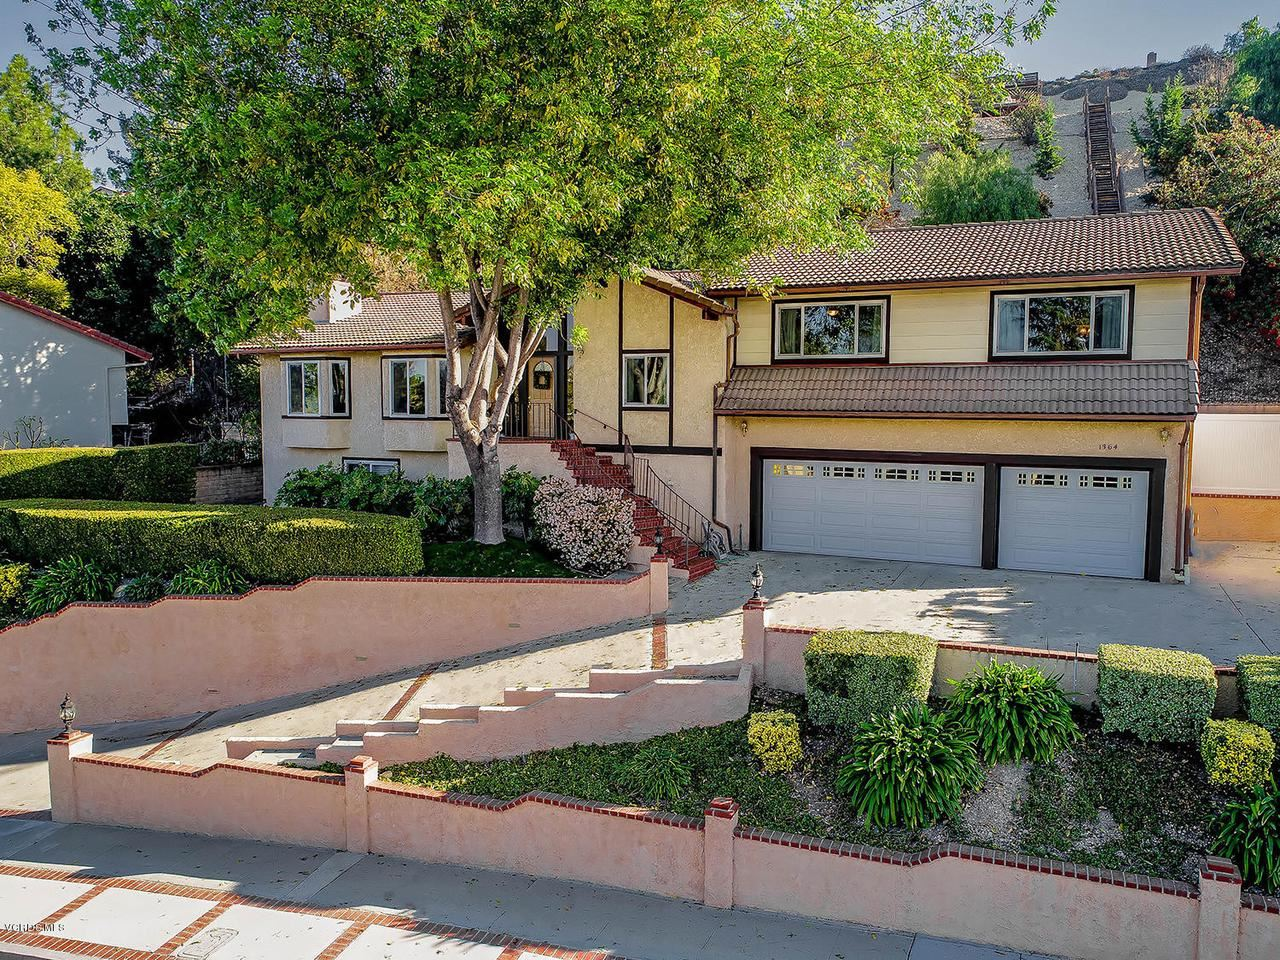 Photo of 1364 ROSELAWN Avenue, Thousand Oaks, CA 91362 (MLS # 220001271)